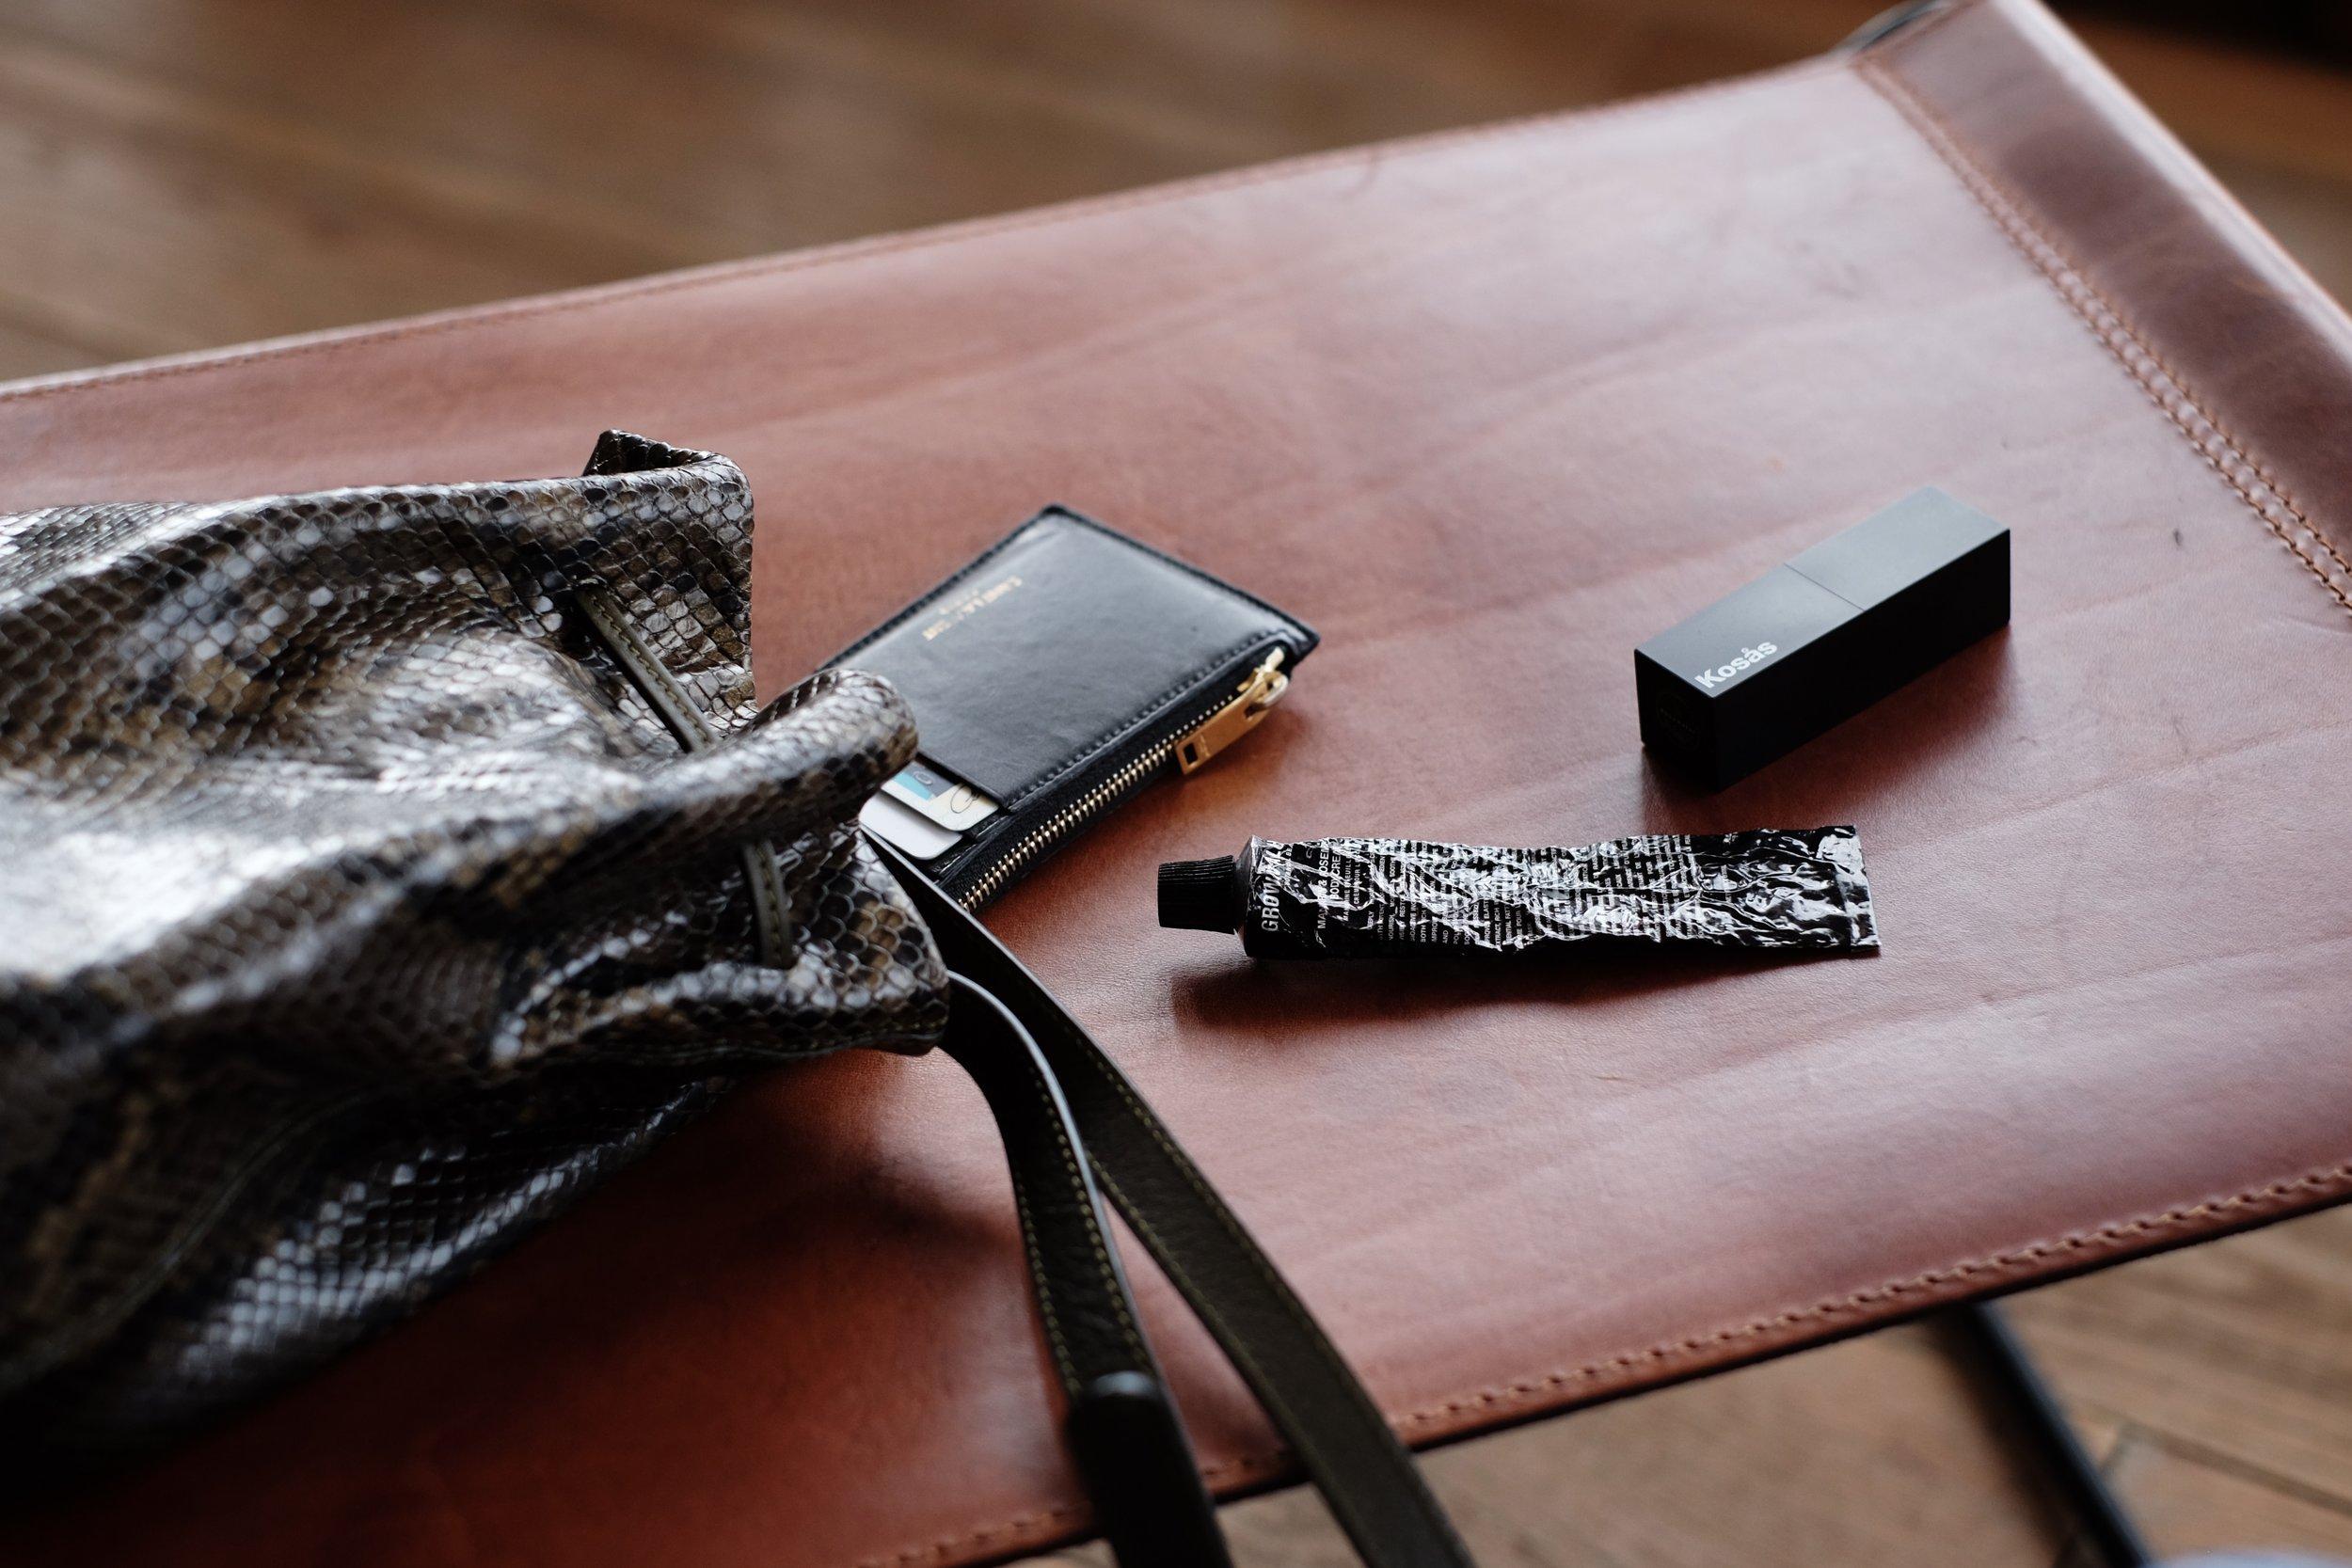 ATP ATELIER   Bag  / SAINT LAURENT   Wallet  (Similar   here  ) /KOSAS   Lipstick